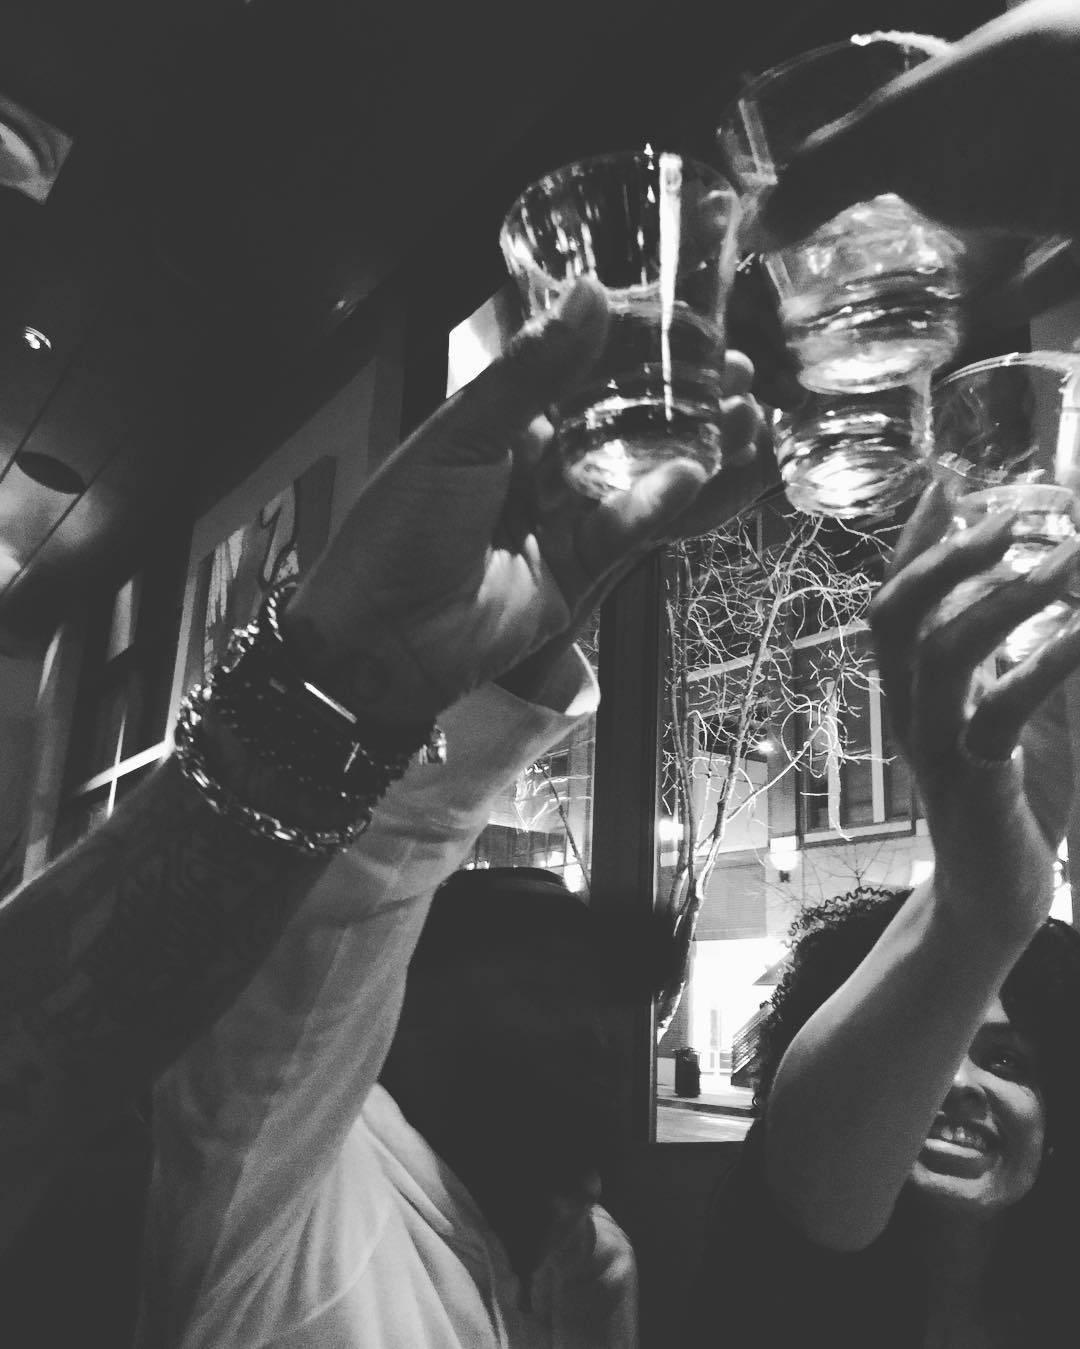 Demetria McKinney completed her album - March 11, 2017